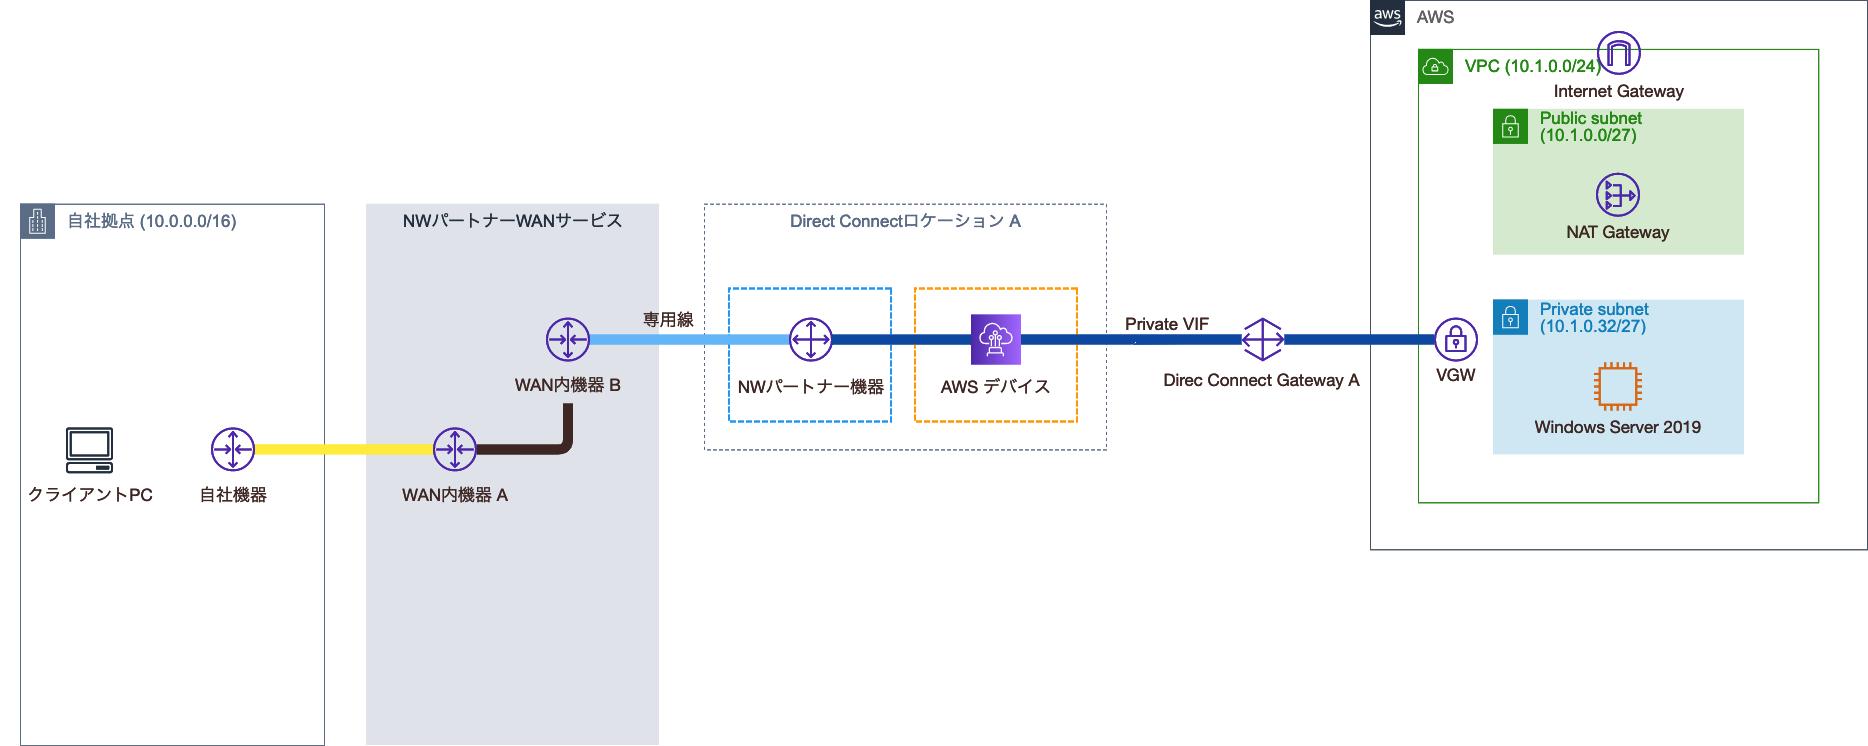 Transit VIF切替前の構成図